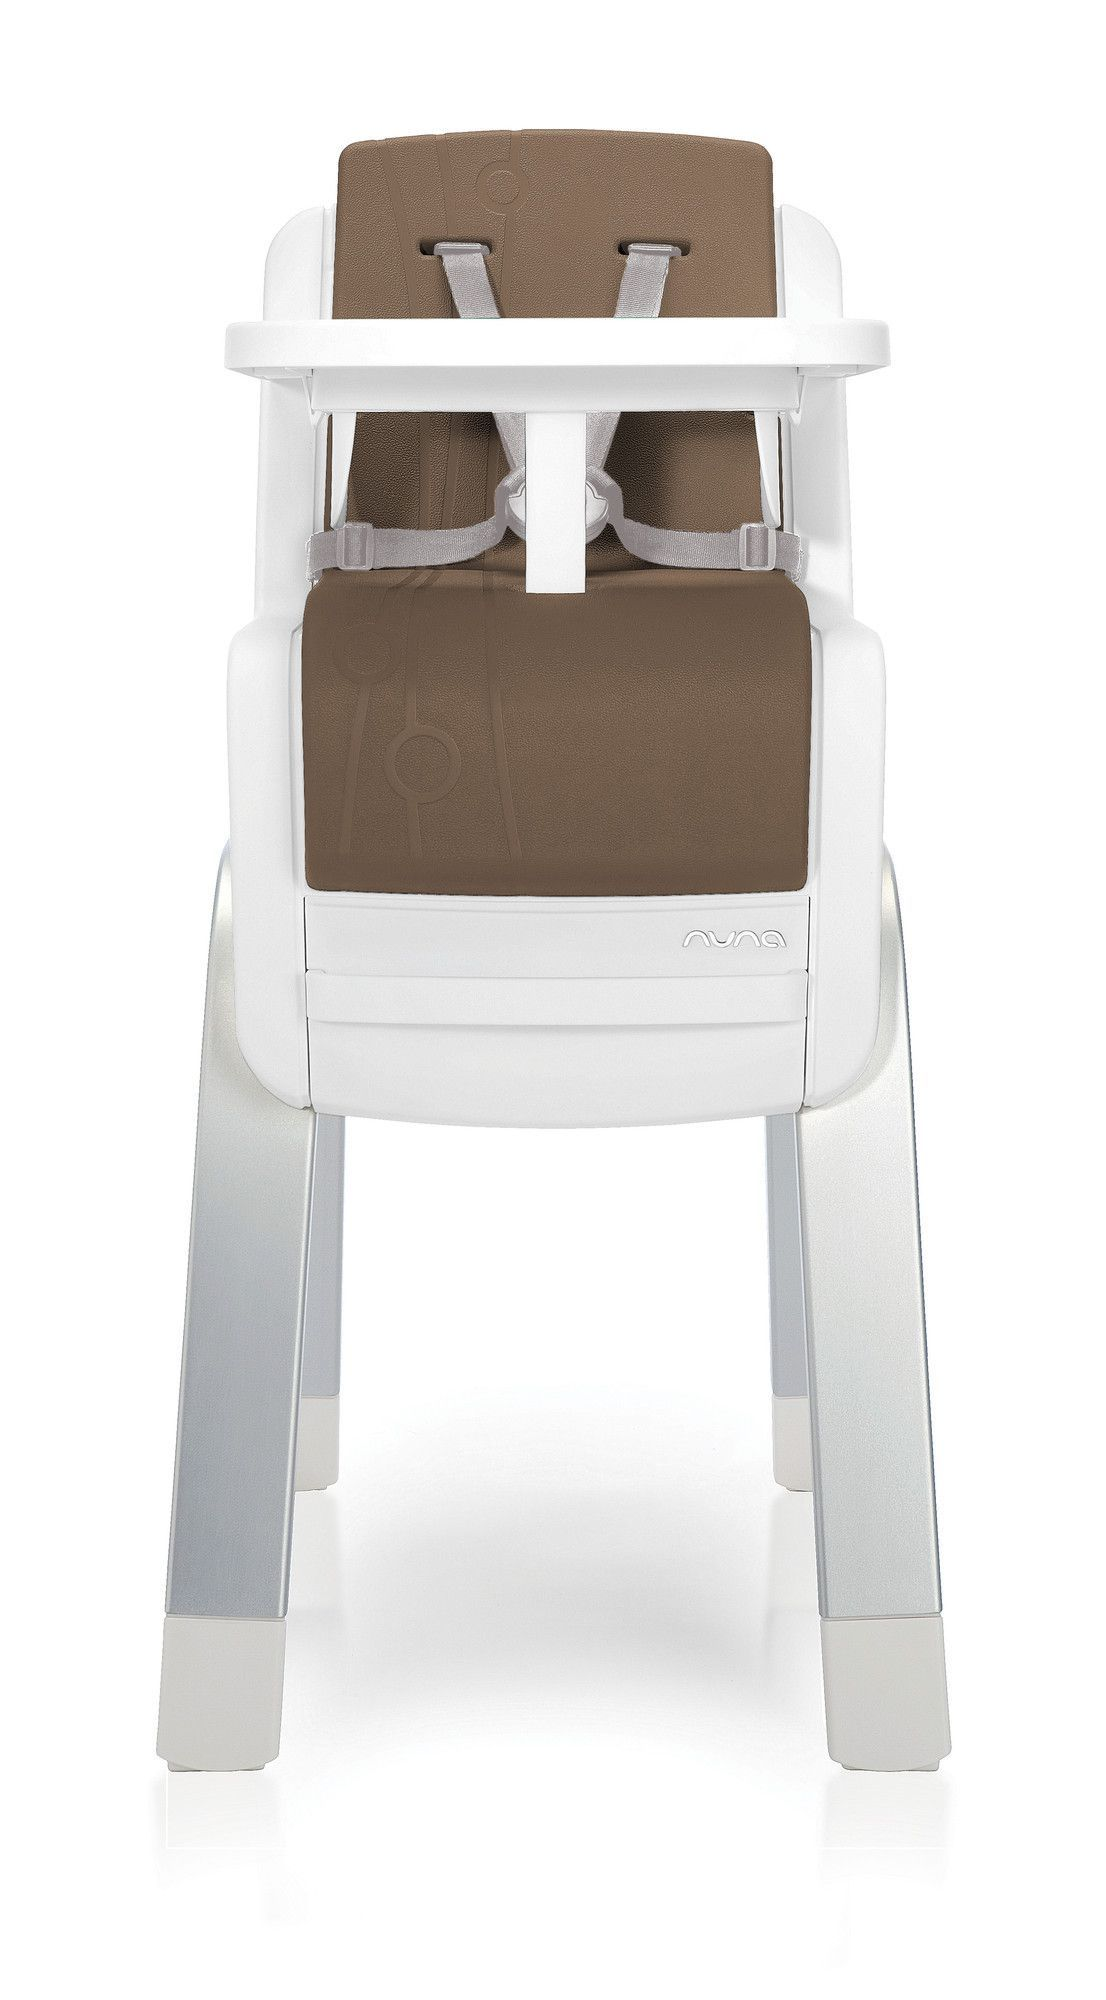 Graco high chair 4 in 1 nuna zaaz convertible high chair  almond  products  pinterest